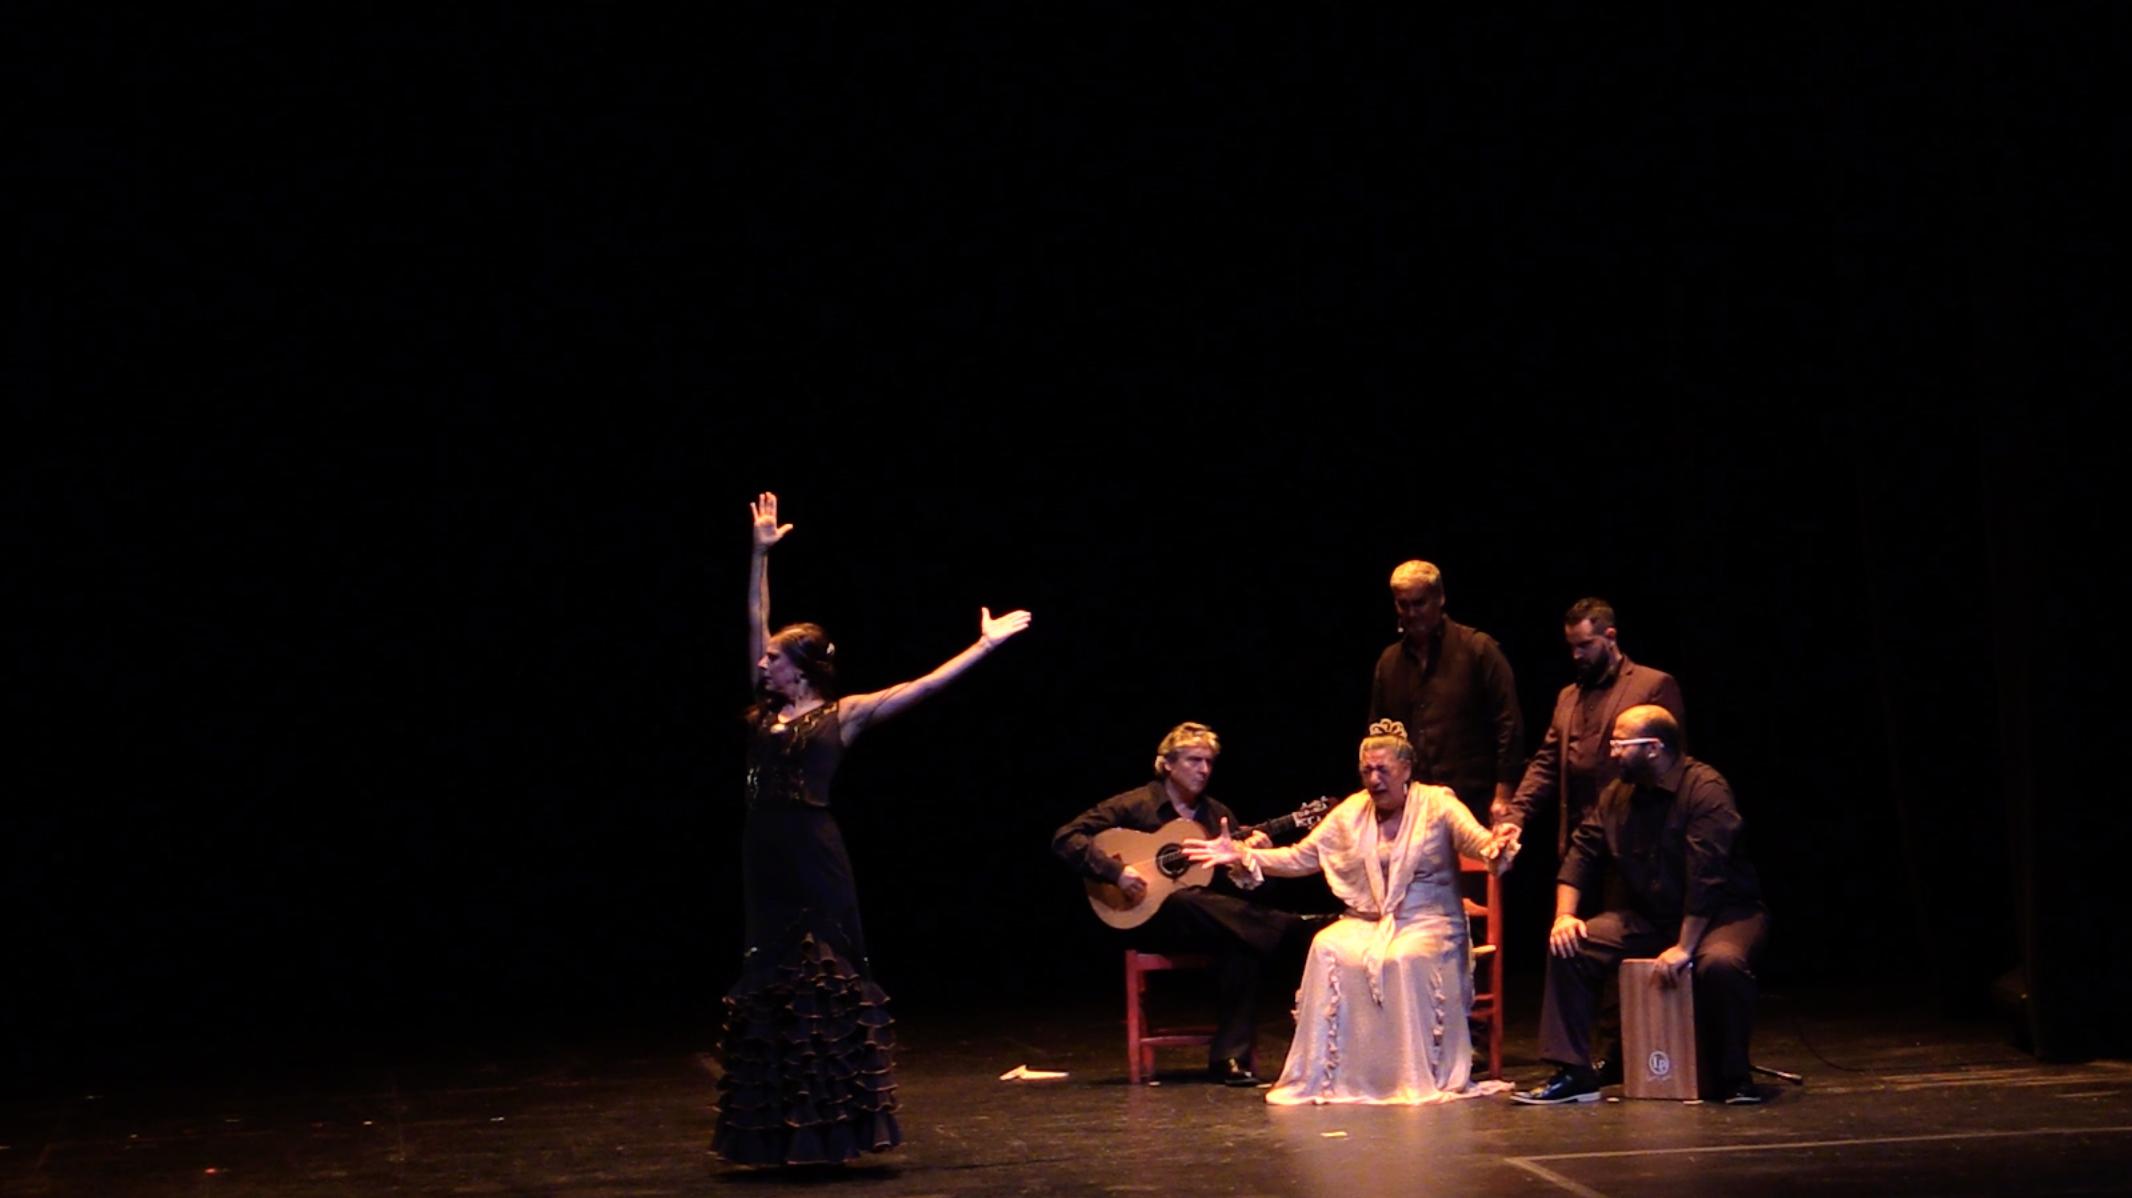 Ending Solo by Carola Zertuche con Juana la del Pipa, Chuscales, Diego Alvarez, Jose Cortes, Manuel Gutierrez